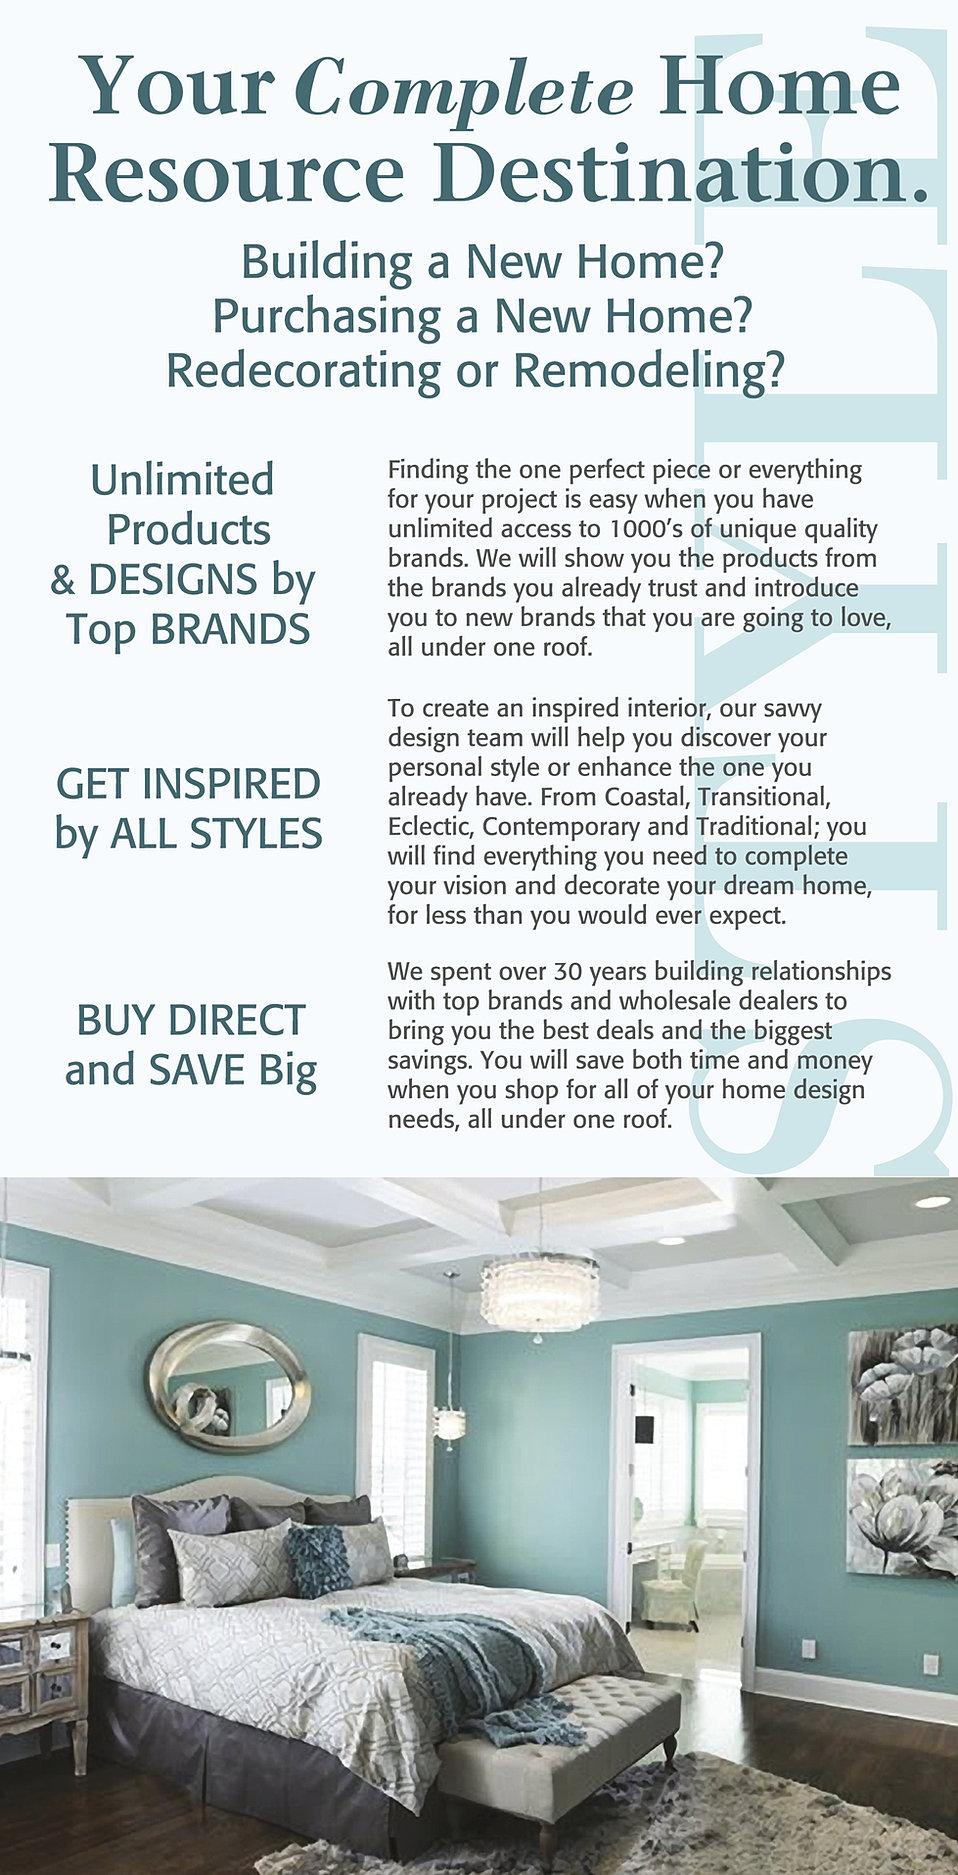 Dezign Inspirations /Home Design Resource | Resources